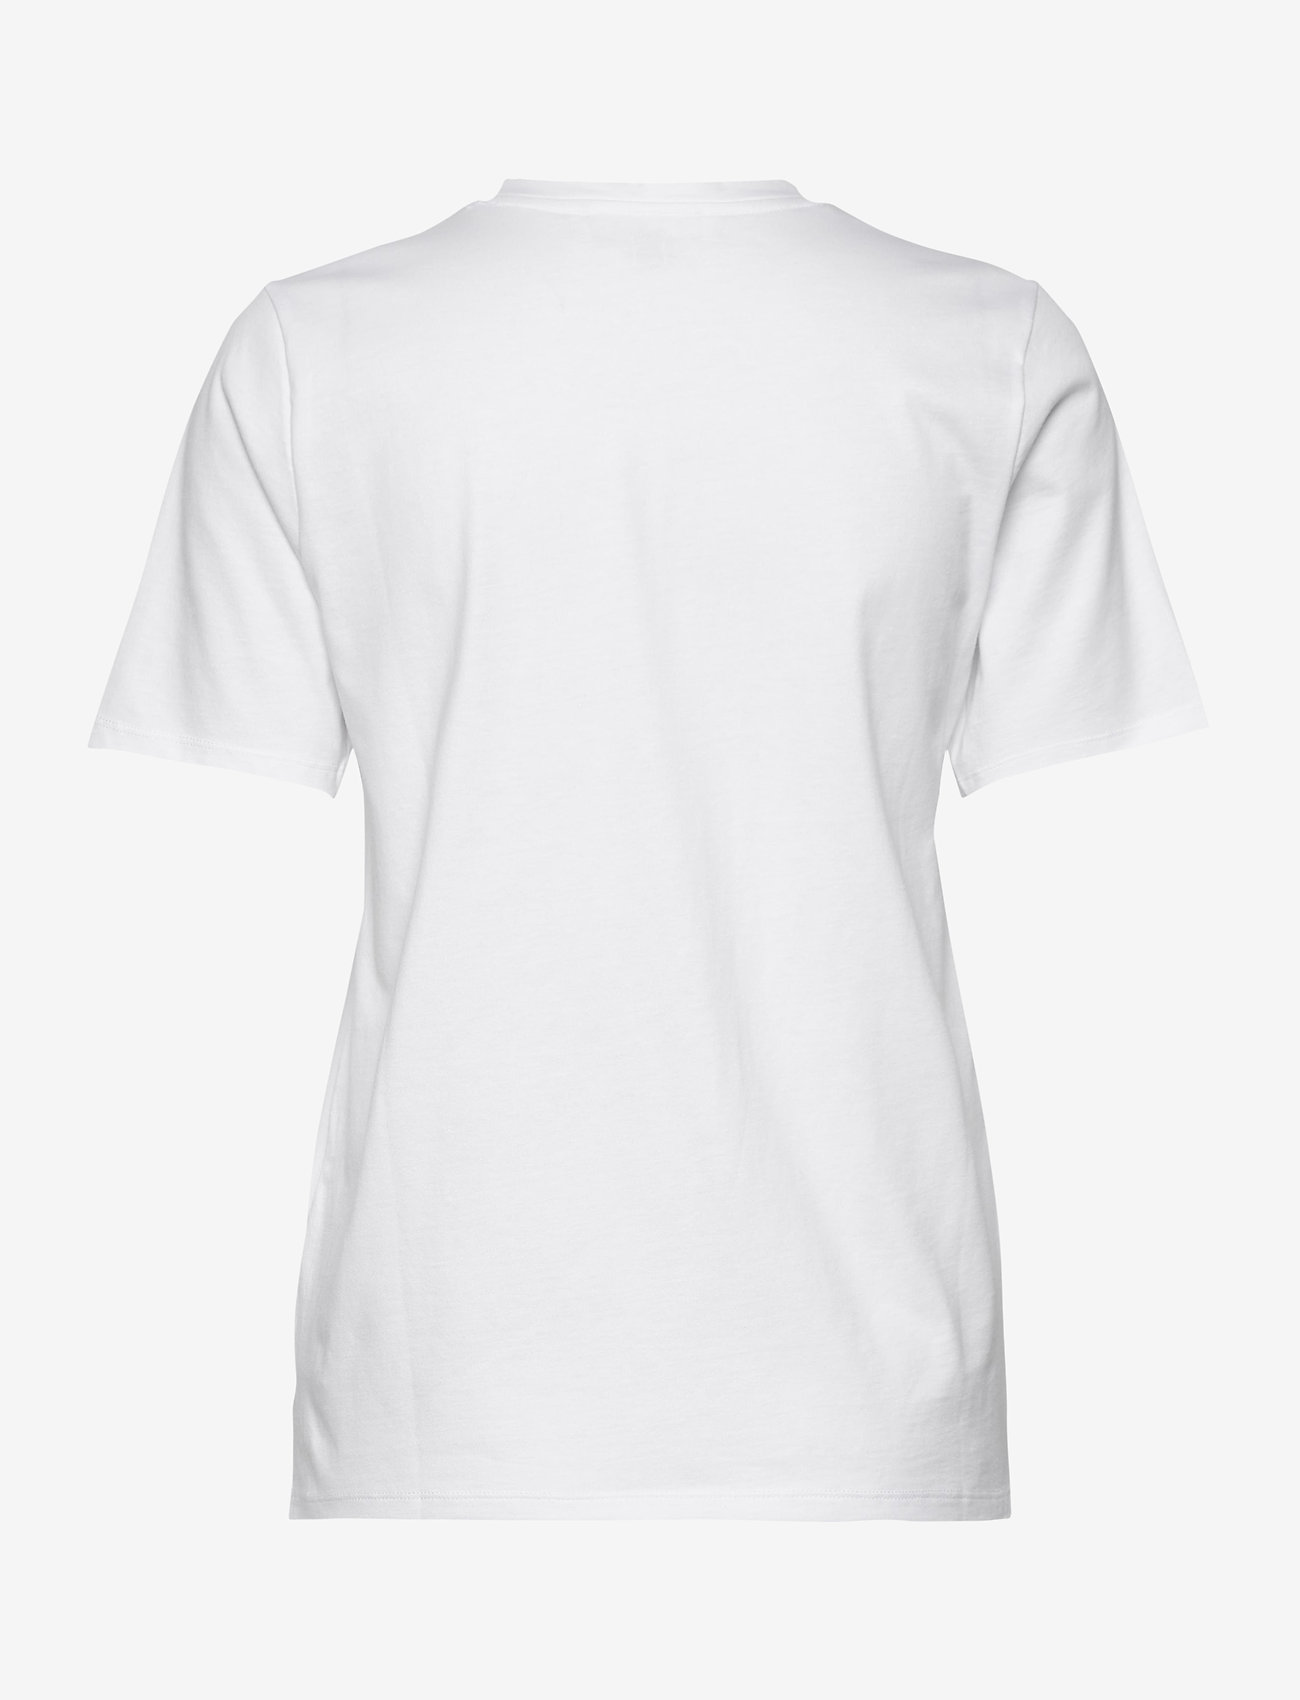 Tiedye Mk Crcl Tshirt (Crew Blue) (900 kr) Michael Kors